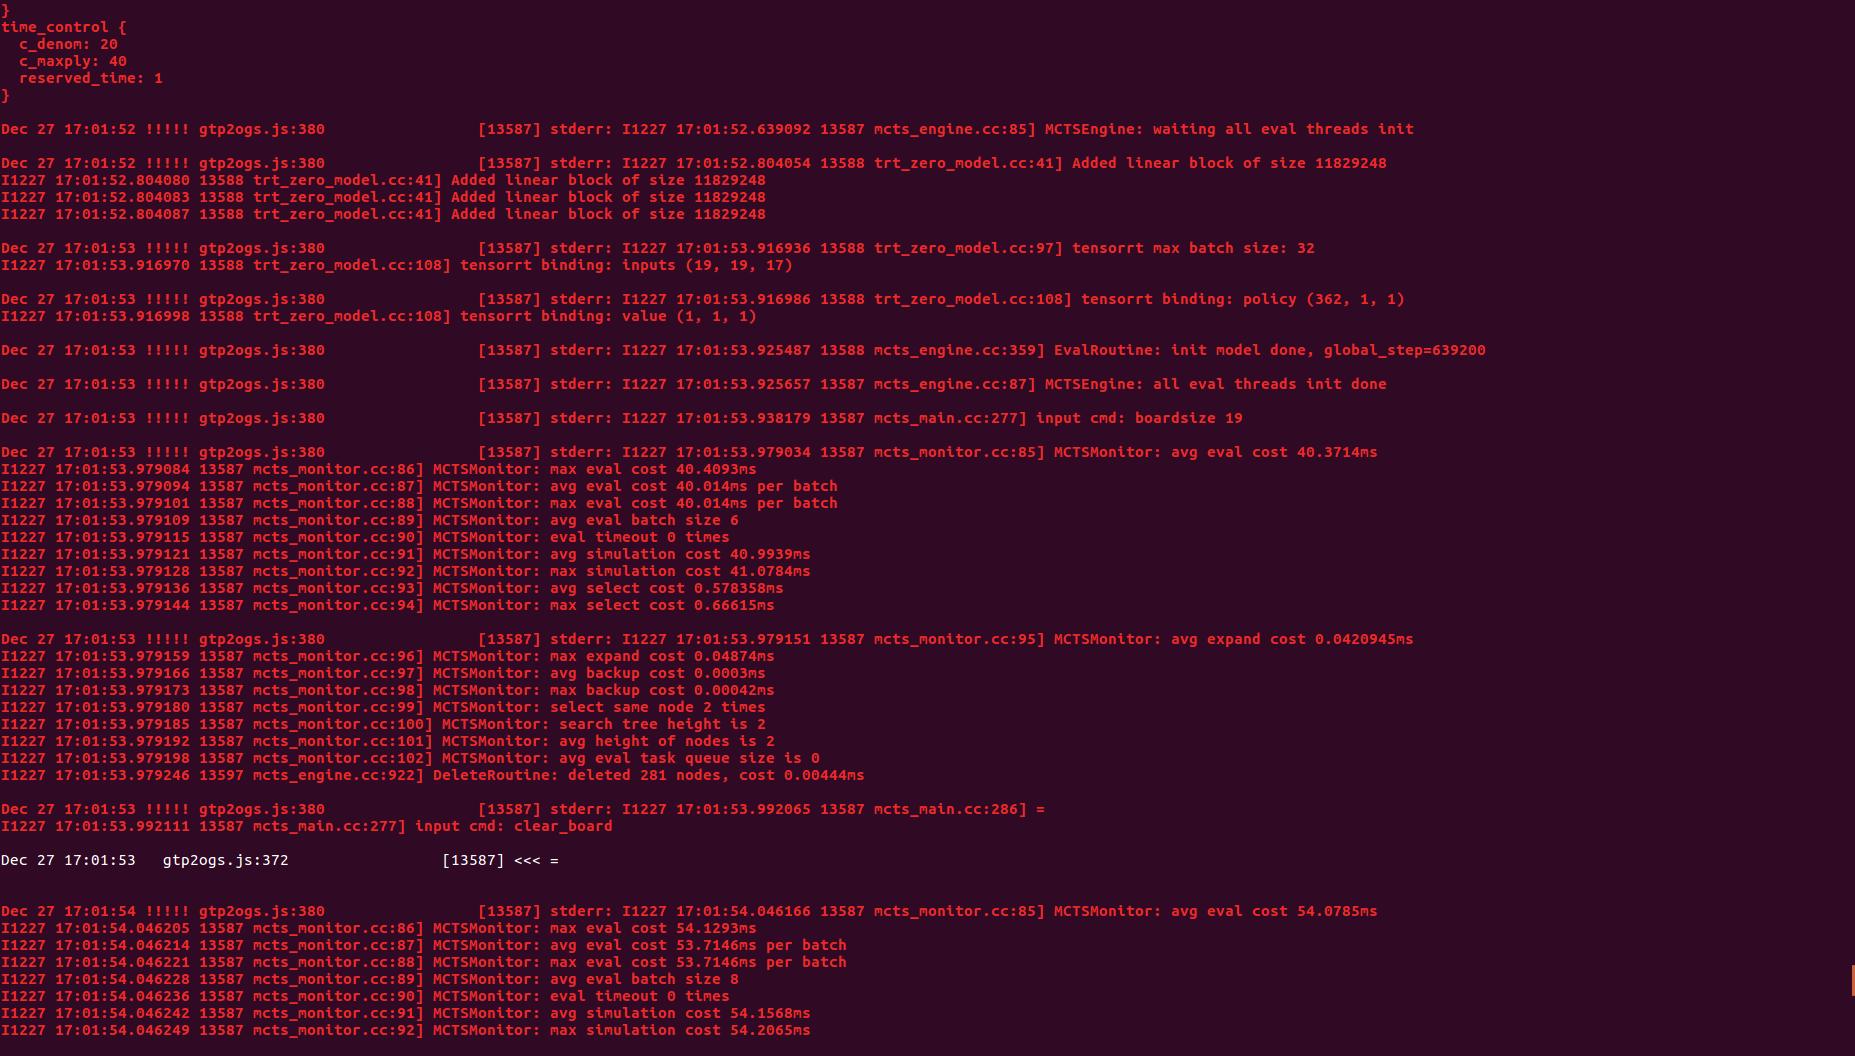 PyCUDA ubuntu custom max batch size : I tensorflow/core